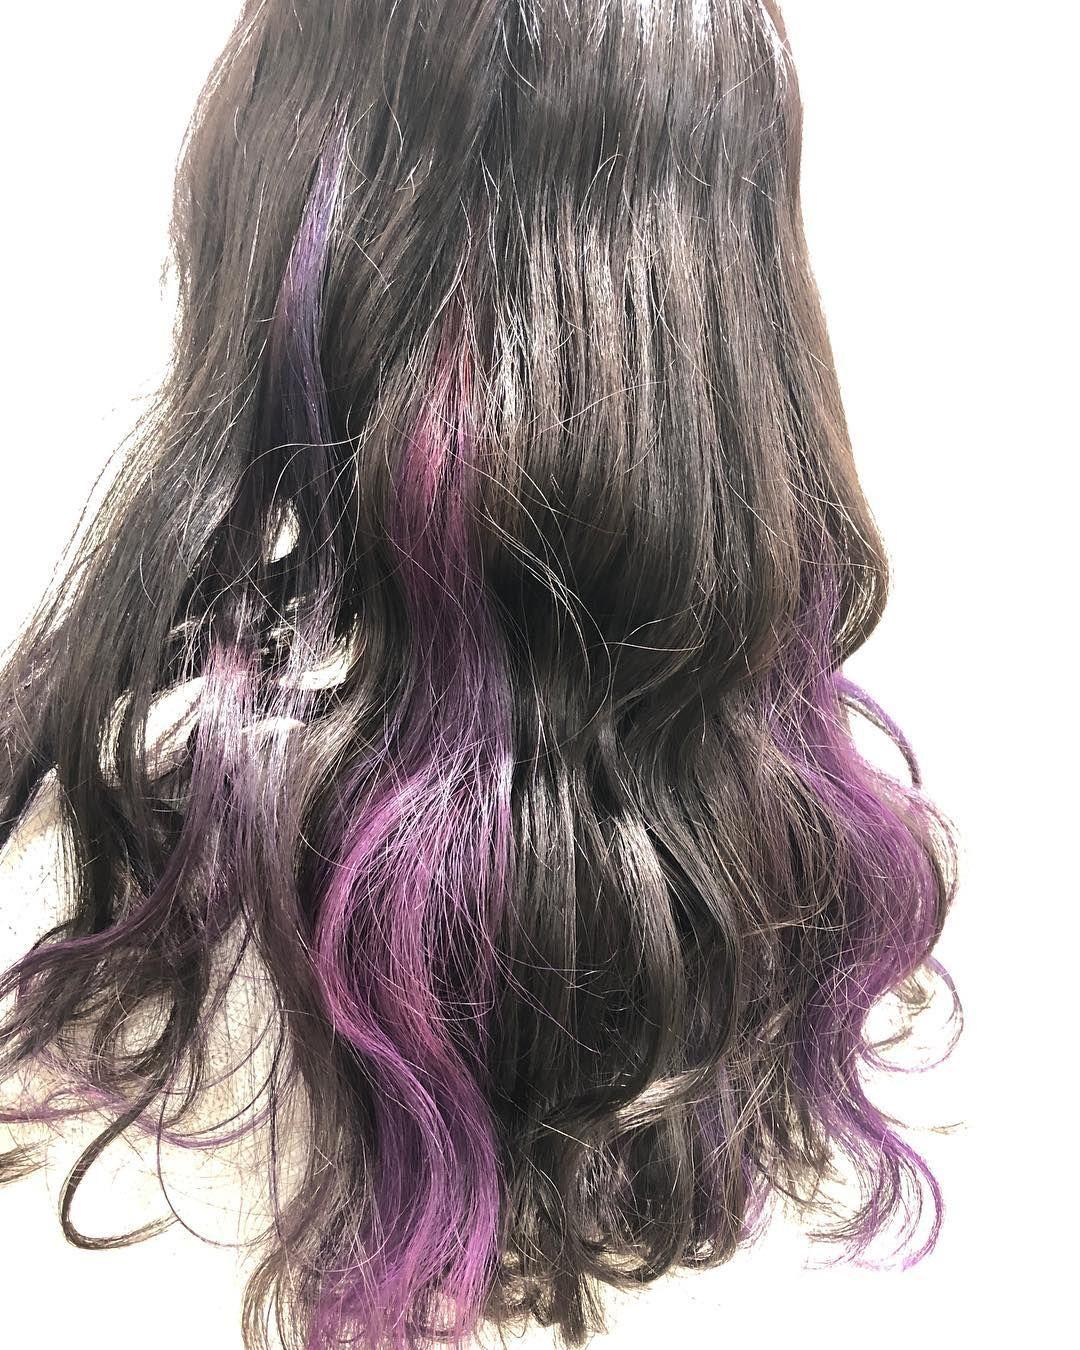 Cabelo おしゃれまとめの人気アイデア Pinterest Niconico 髪 グラデーション グラデーション ヘアカラー